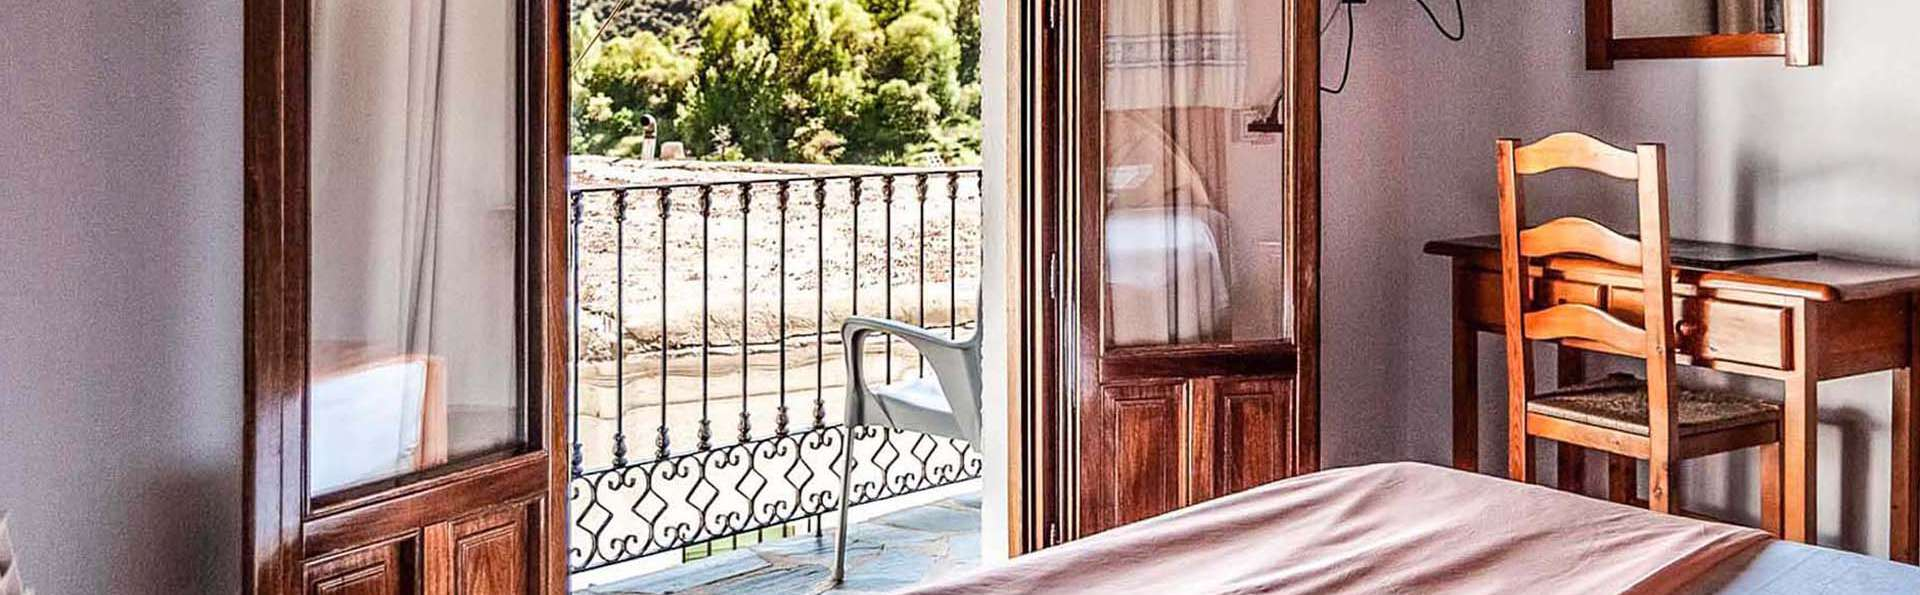 Hotel La Fragua I - EDIT_Hotel_la_Fragua_I_hab_matrimonio_01.jpg